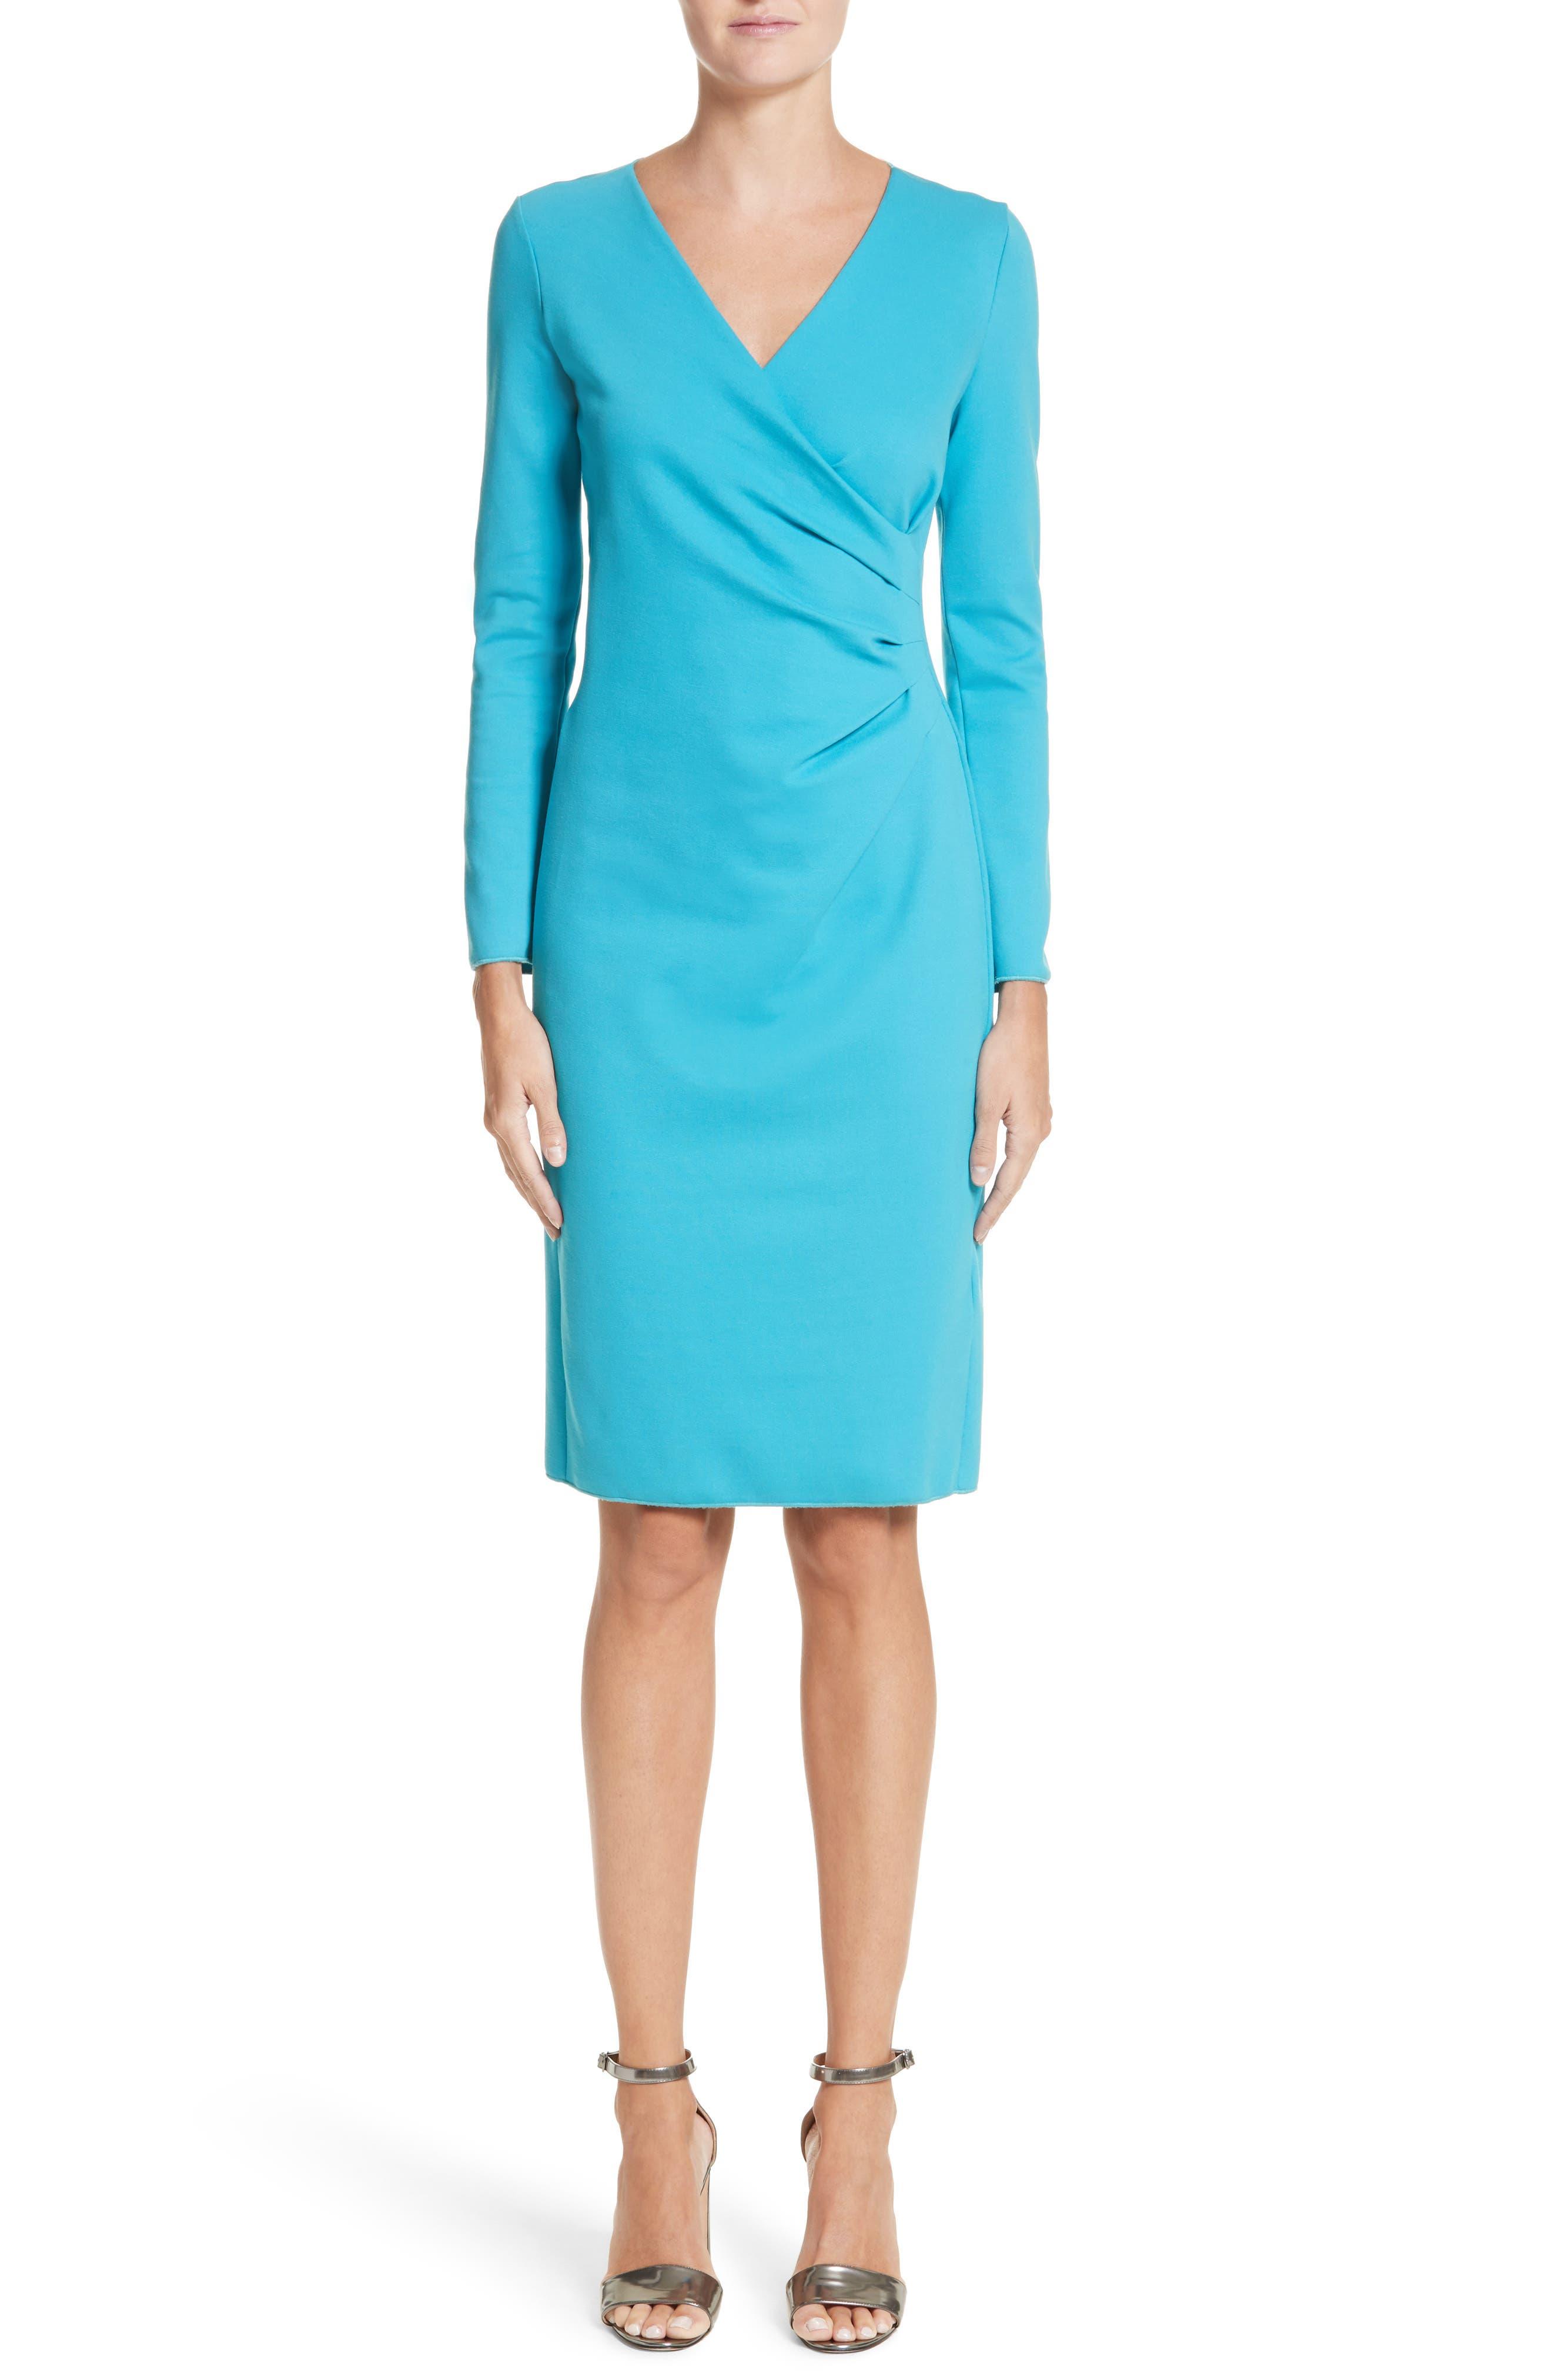 Alternate Image 1 Selected - Emporio Armani Faux Wrap Side Pleat Dress